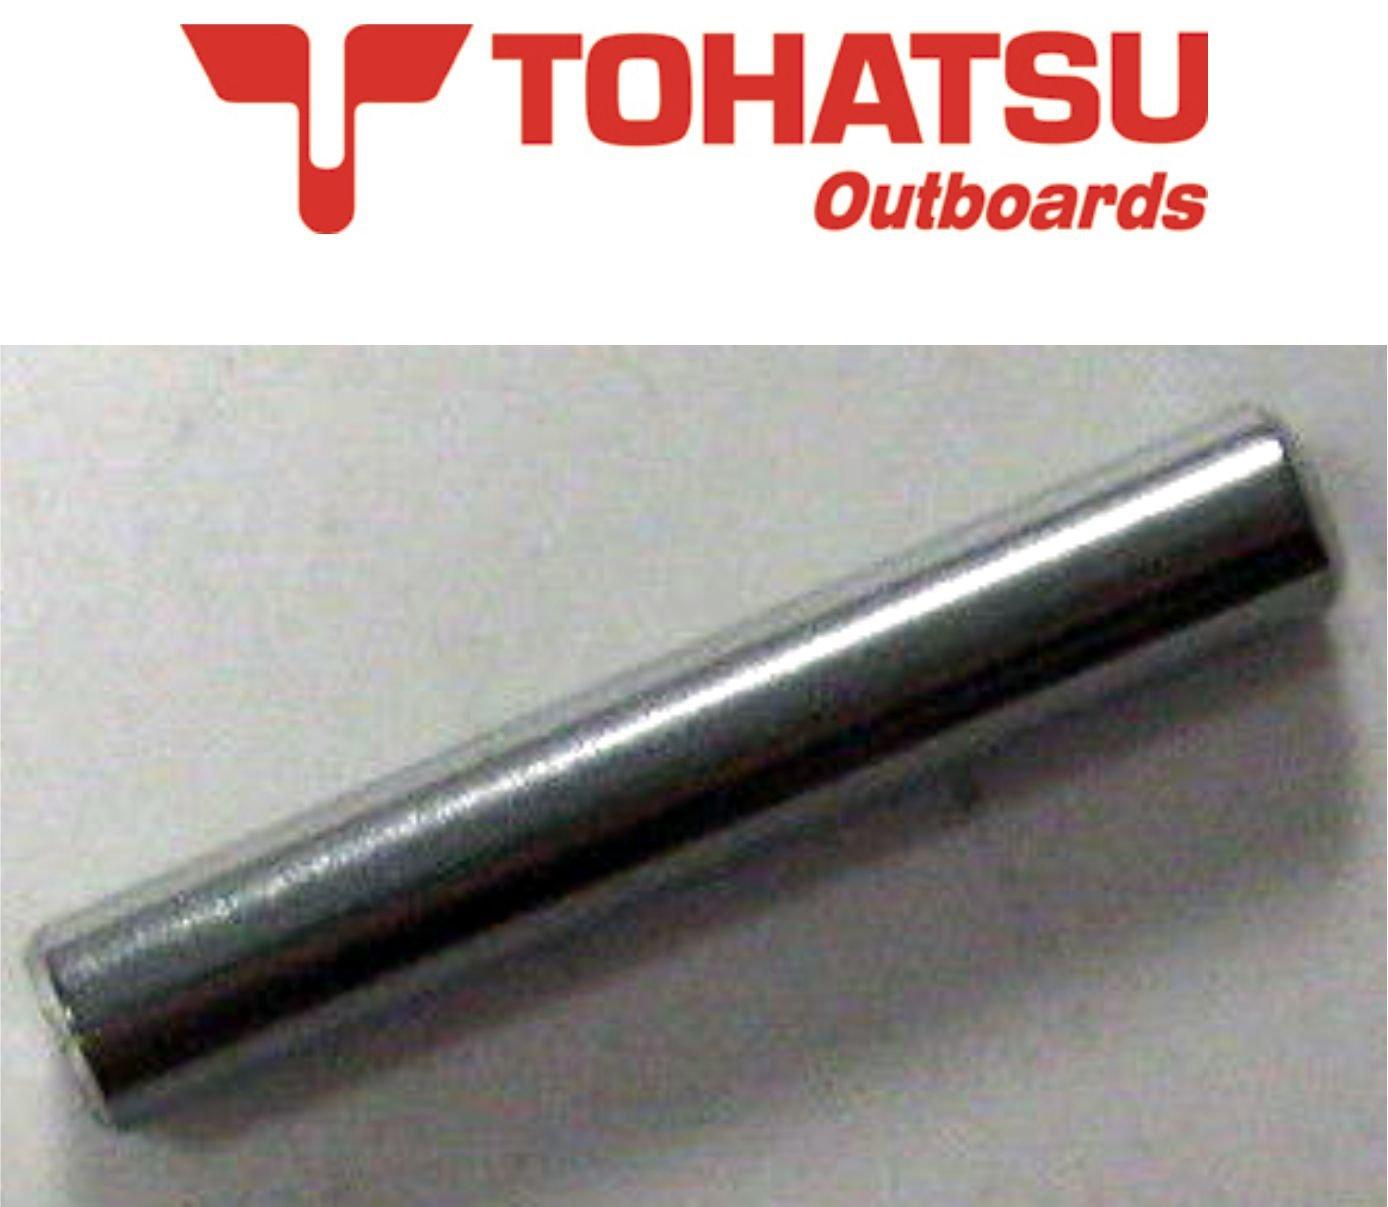 Tohatsu OEM Nissan Outboards Prop Shear Pin 2HP-3.5HP